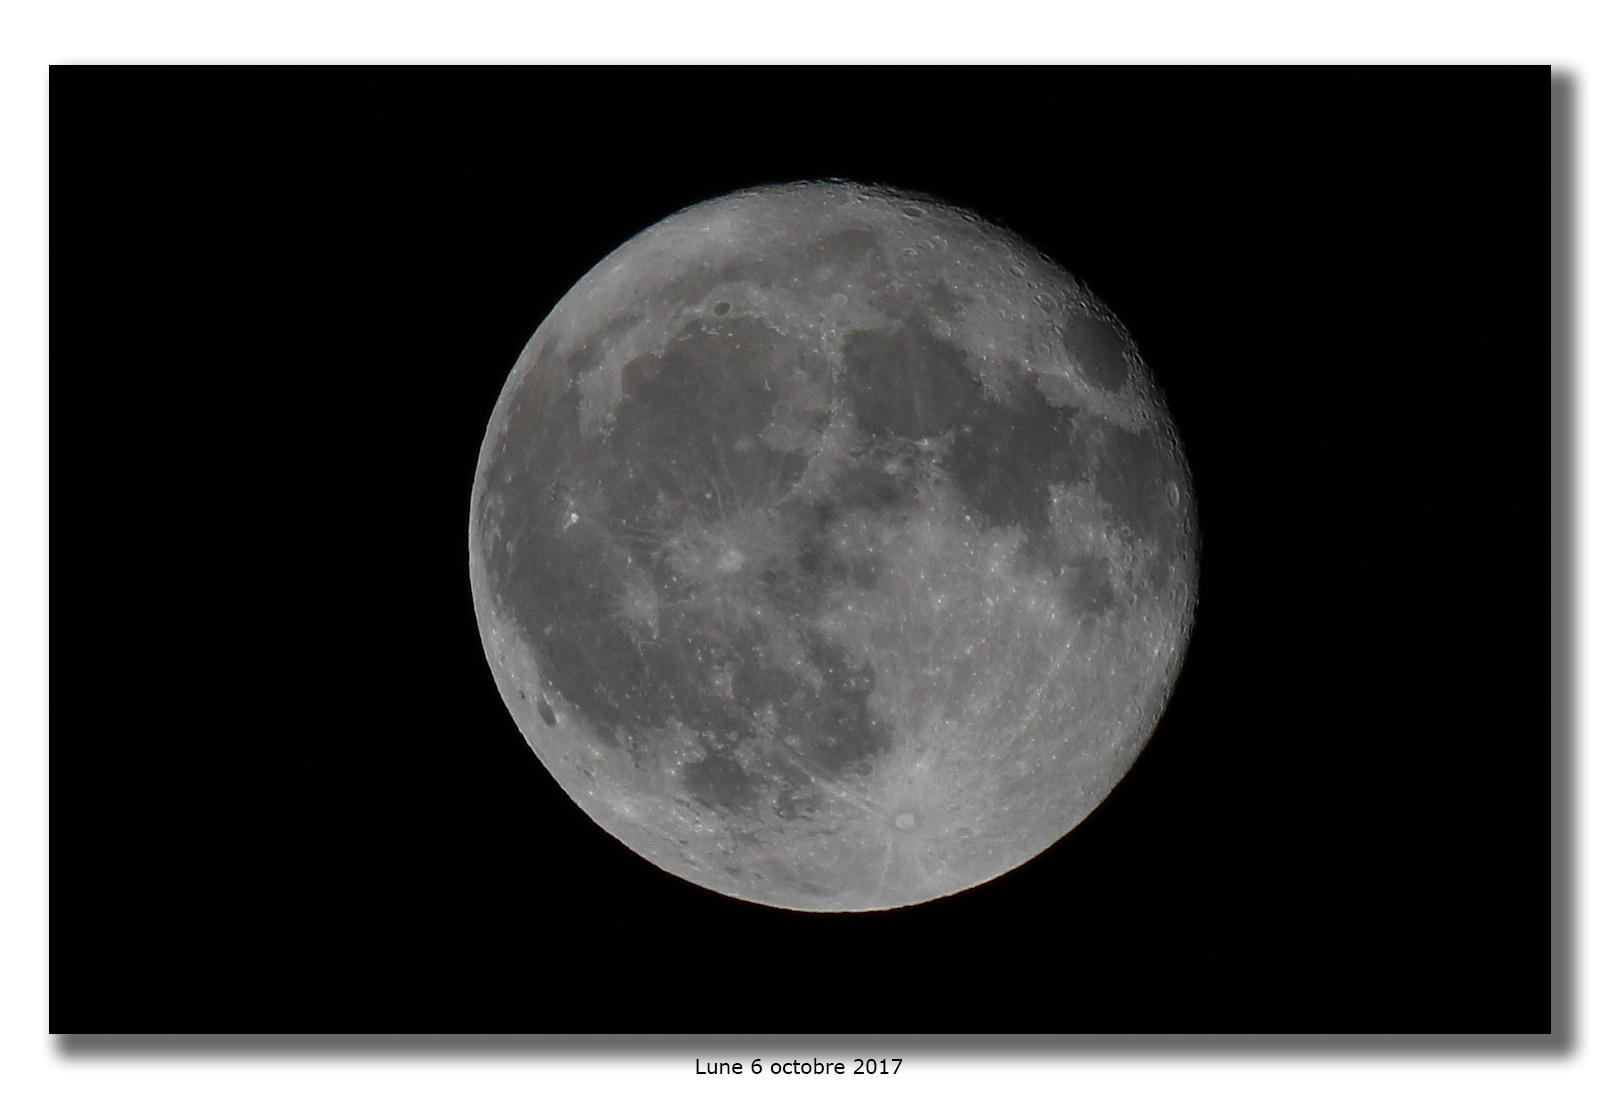 Lune 6 octobre 2017.jpg